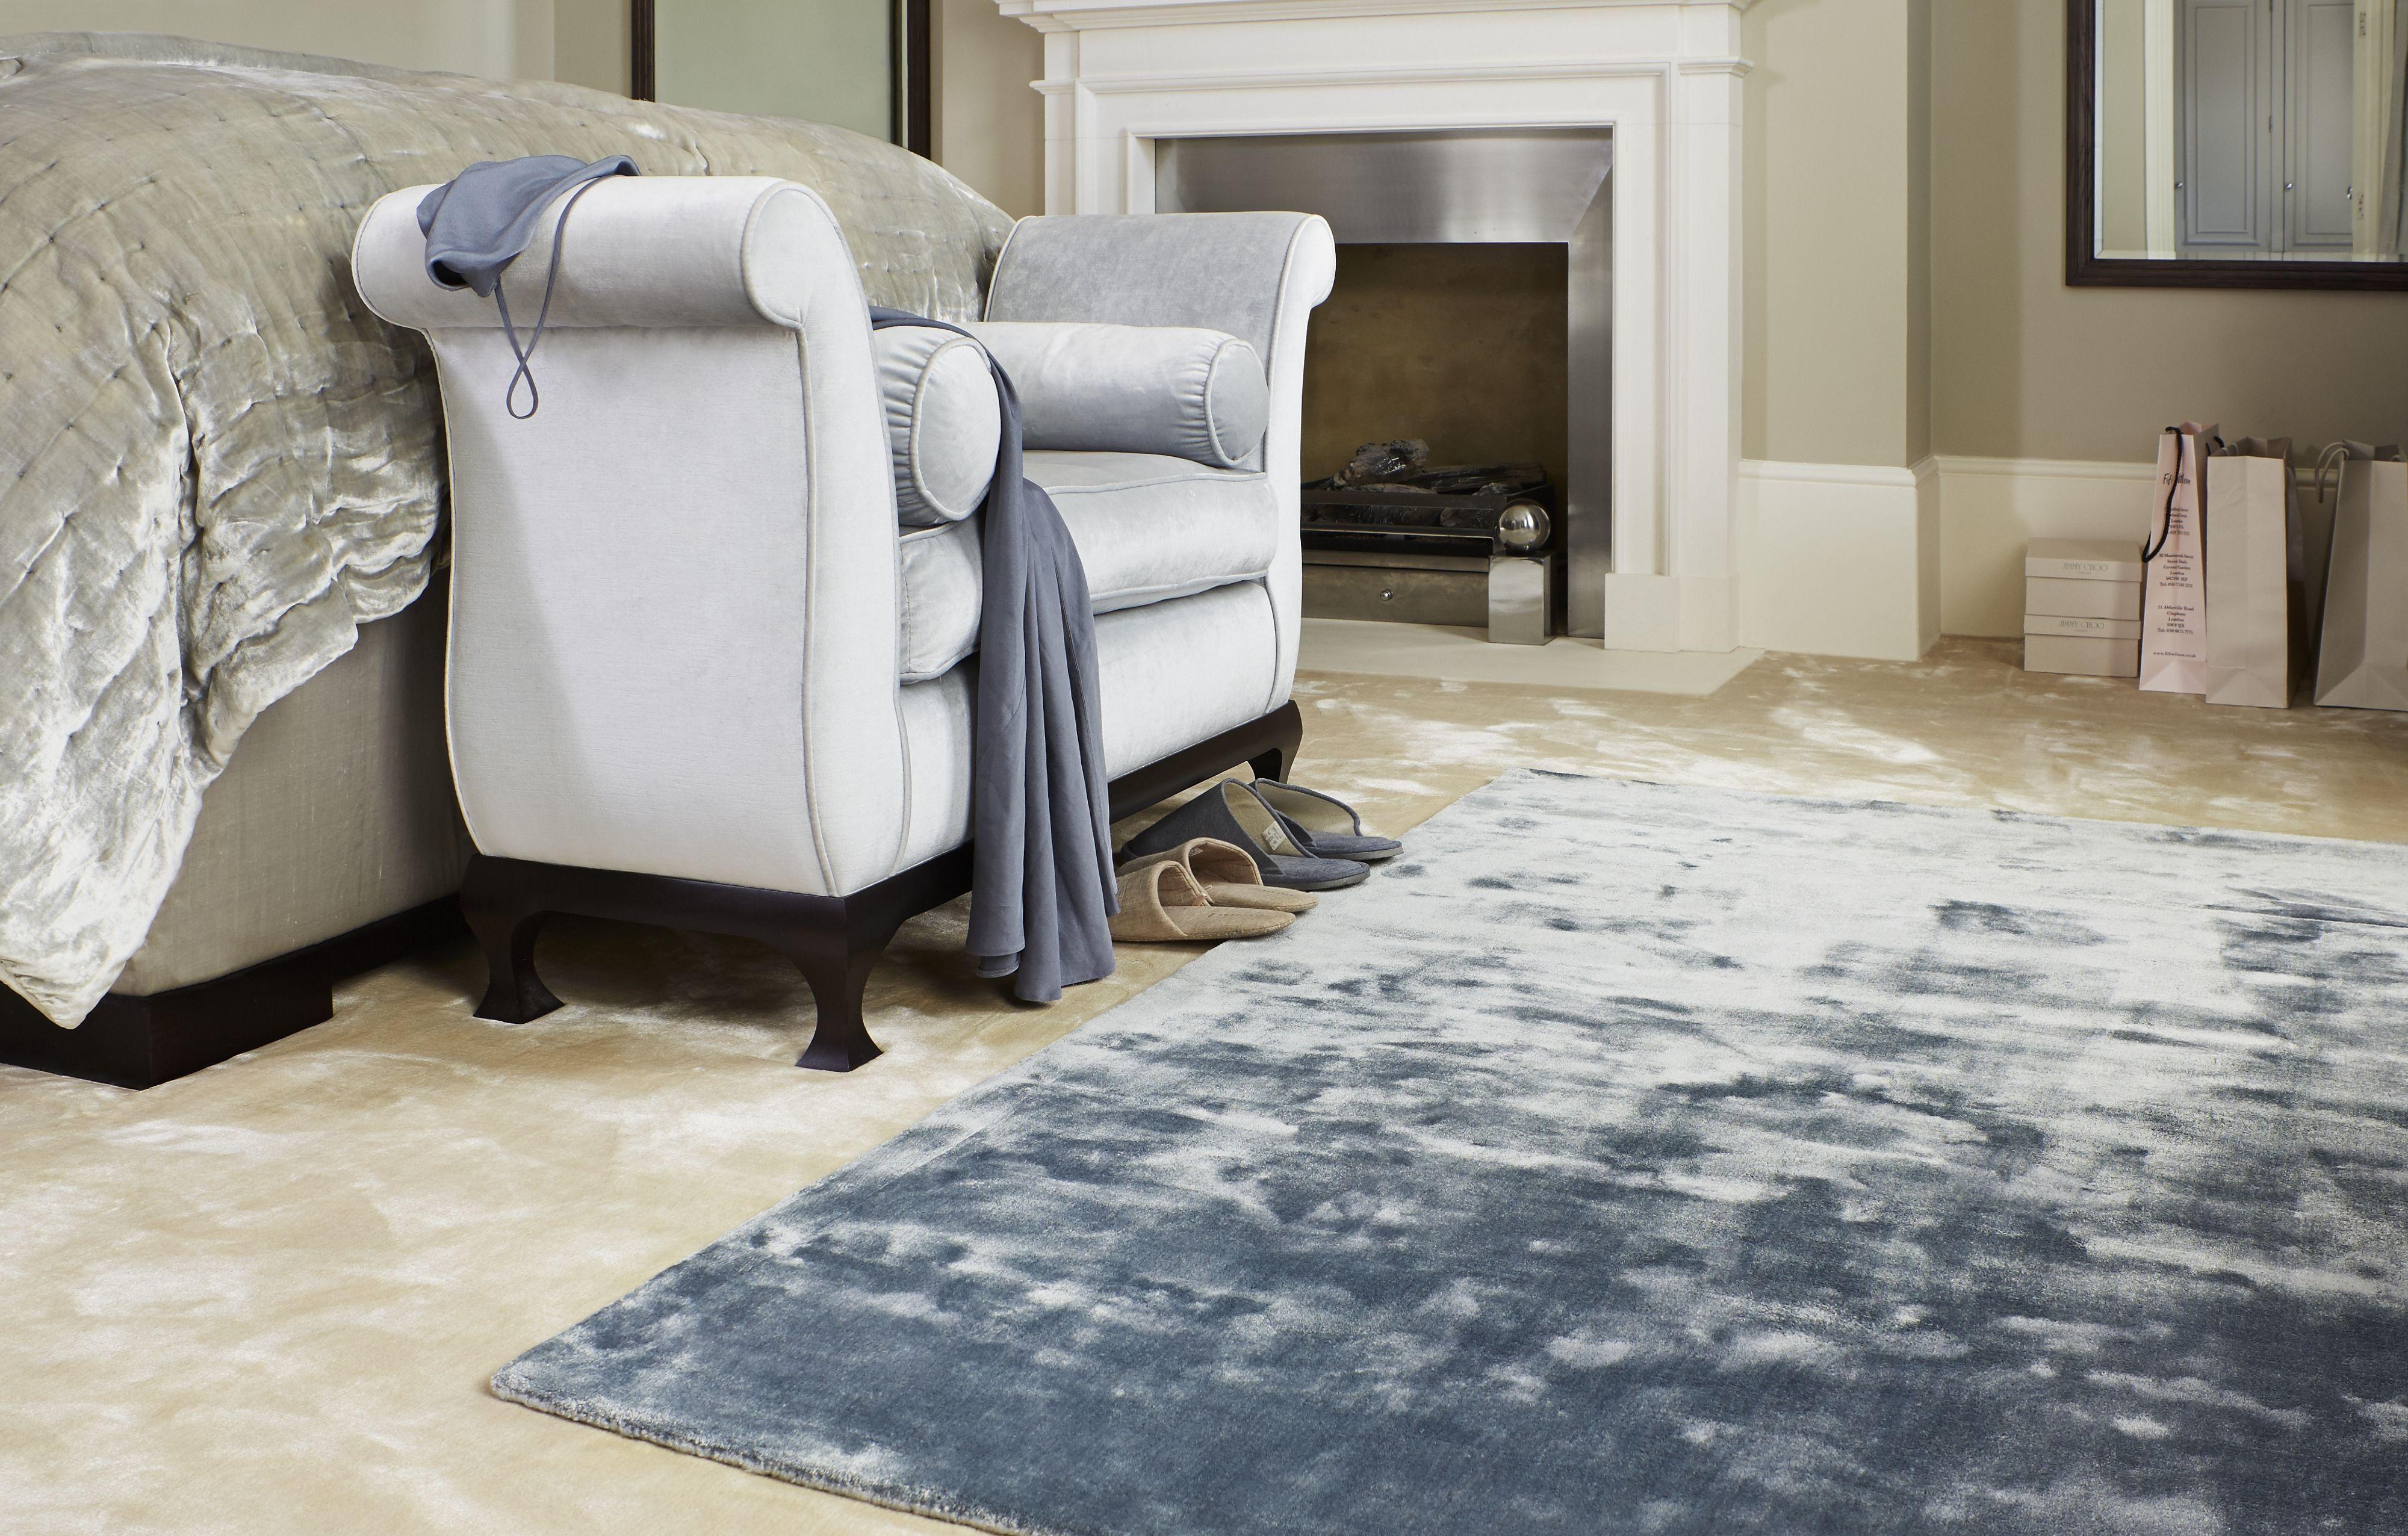 Jacaranda S Simla Atlantic Blue Hand Woven Rug On Jacaranda S Simla Ivory Hand Woven Carpet Rugs On Carpet Rugs Quality Carpets